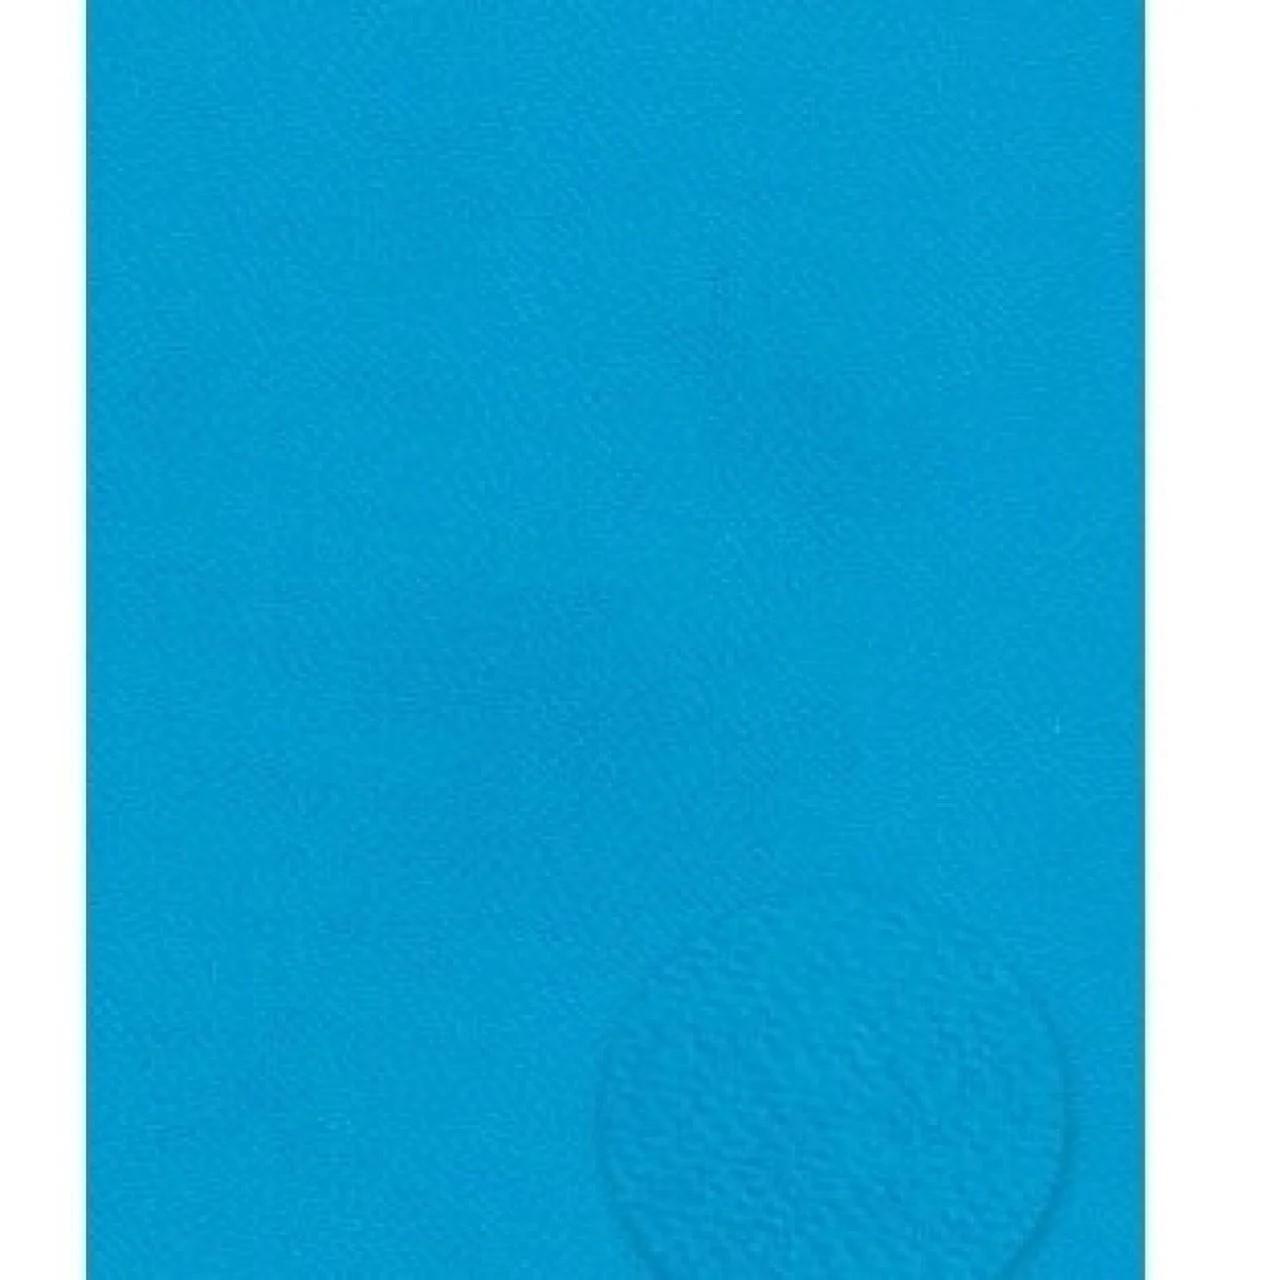 Бумага для пастели Tiziano A4 (21 * 29,7см), №18 adriatic, 160г / м2, синий, среднее зерно, Fabriano